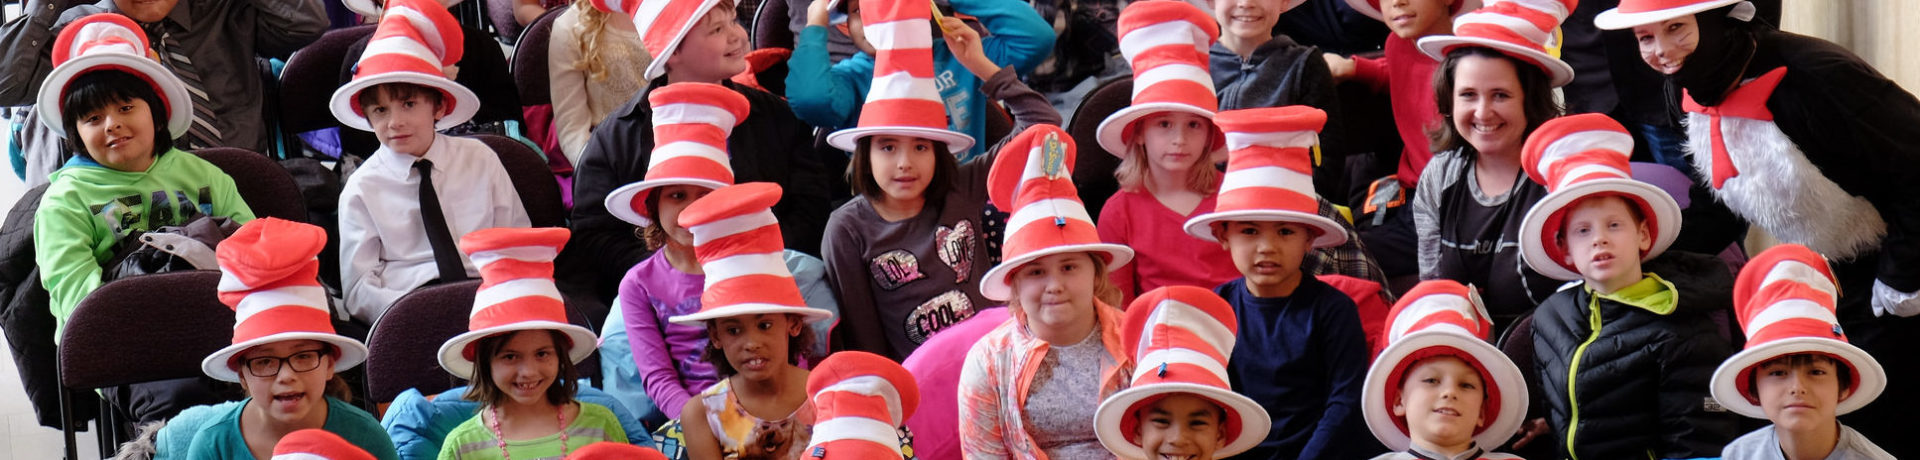 Read Across America kids with hats